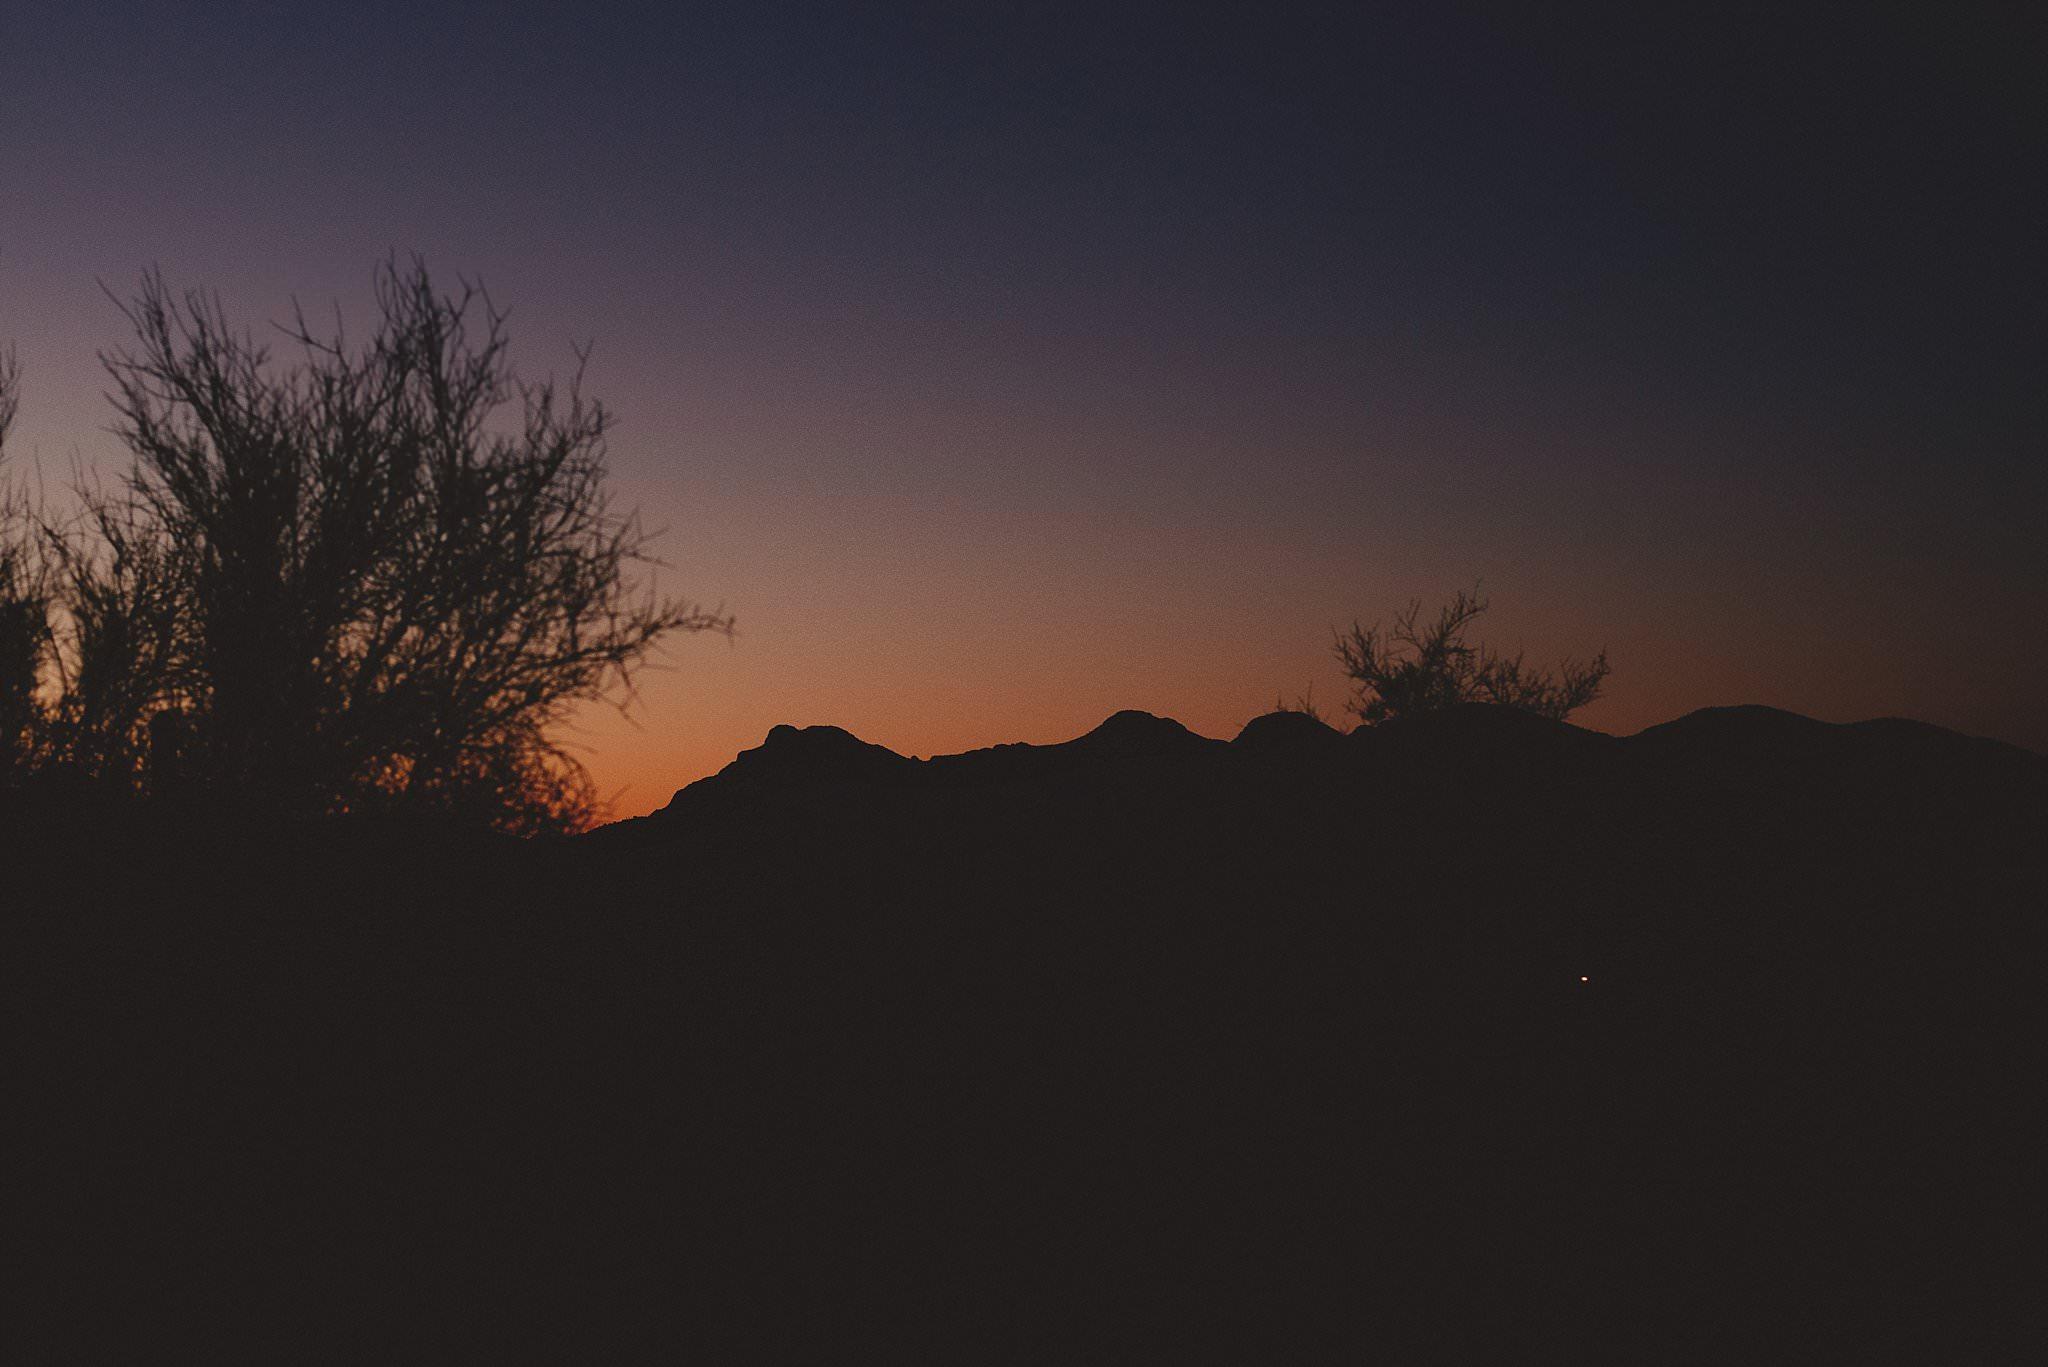 superstition-mountains-desert-engagement-photos-0038.jpg